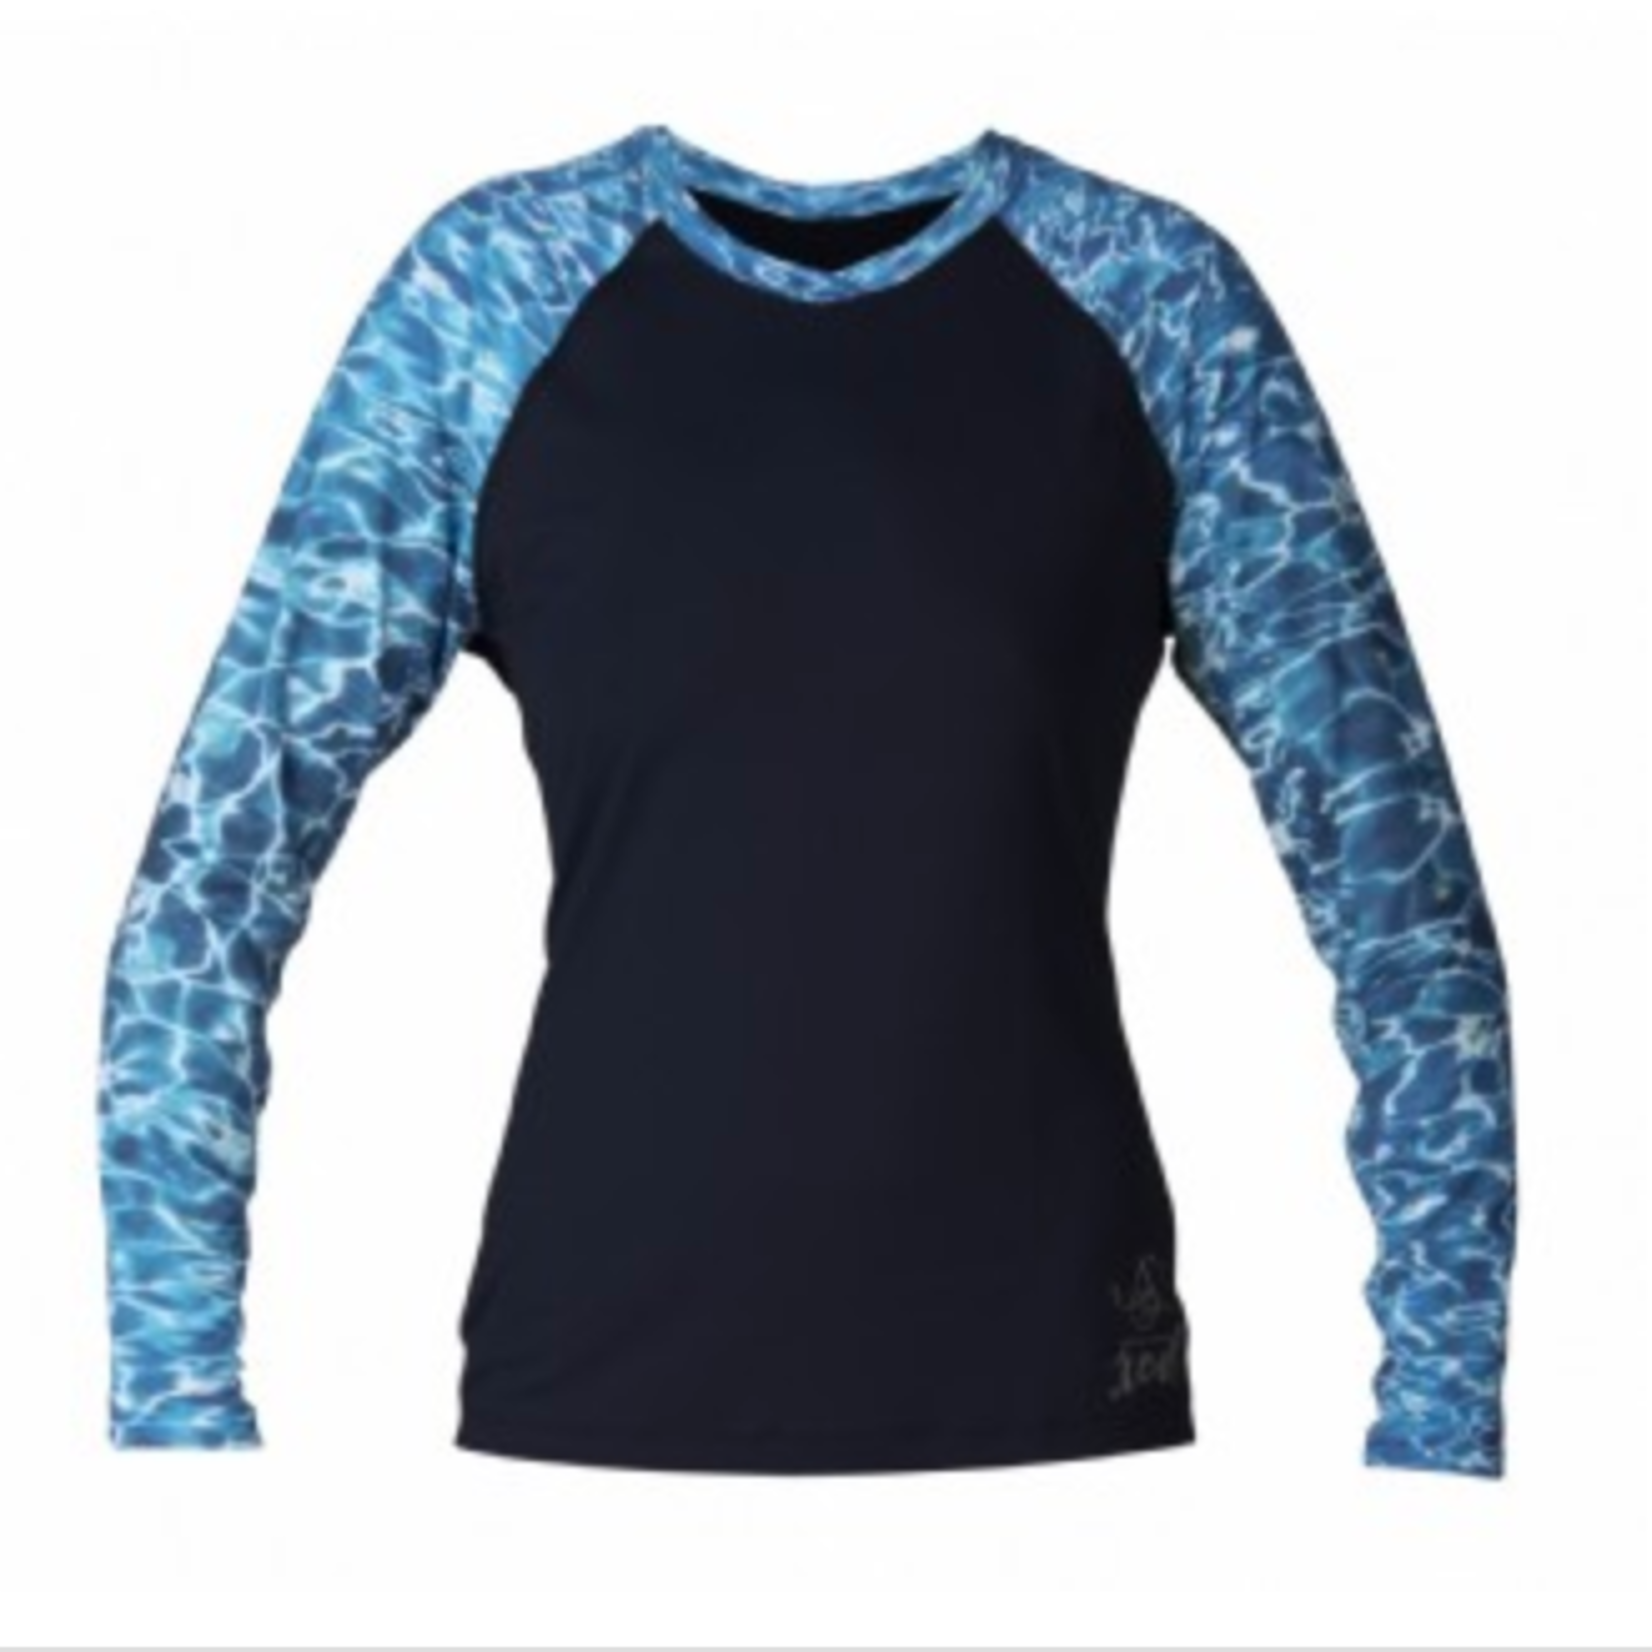 XCEL XCEL Women's Water inspired 6 OZ Long Sleeved